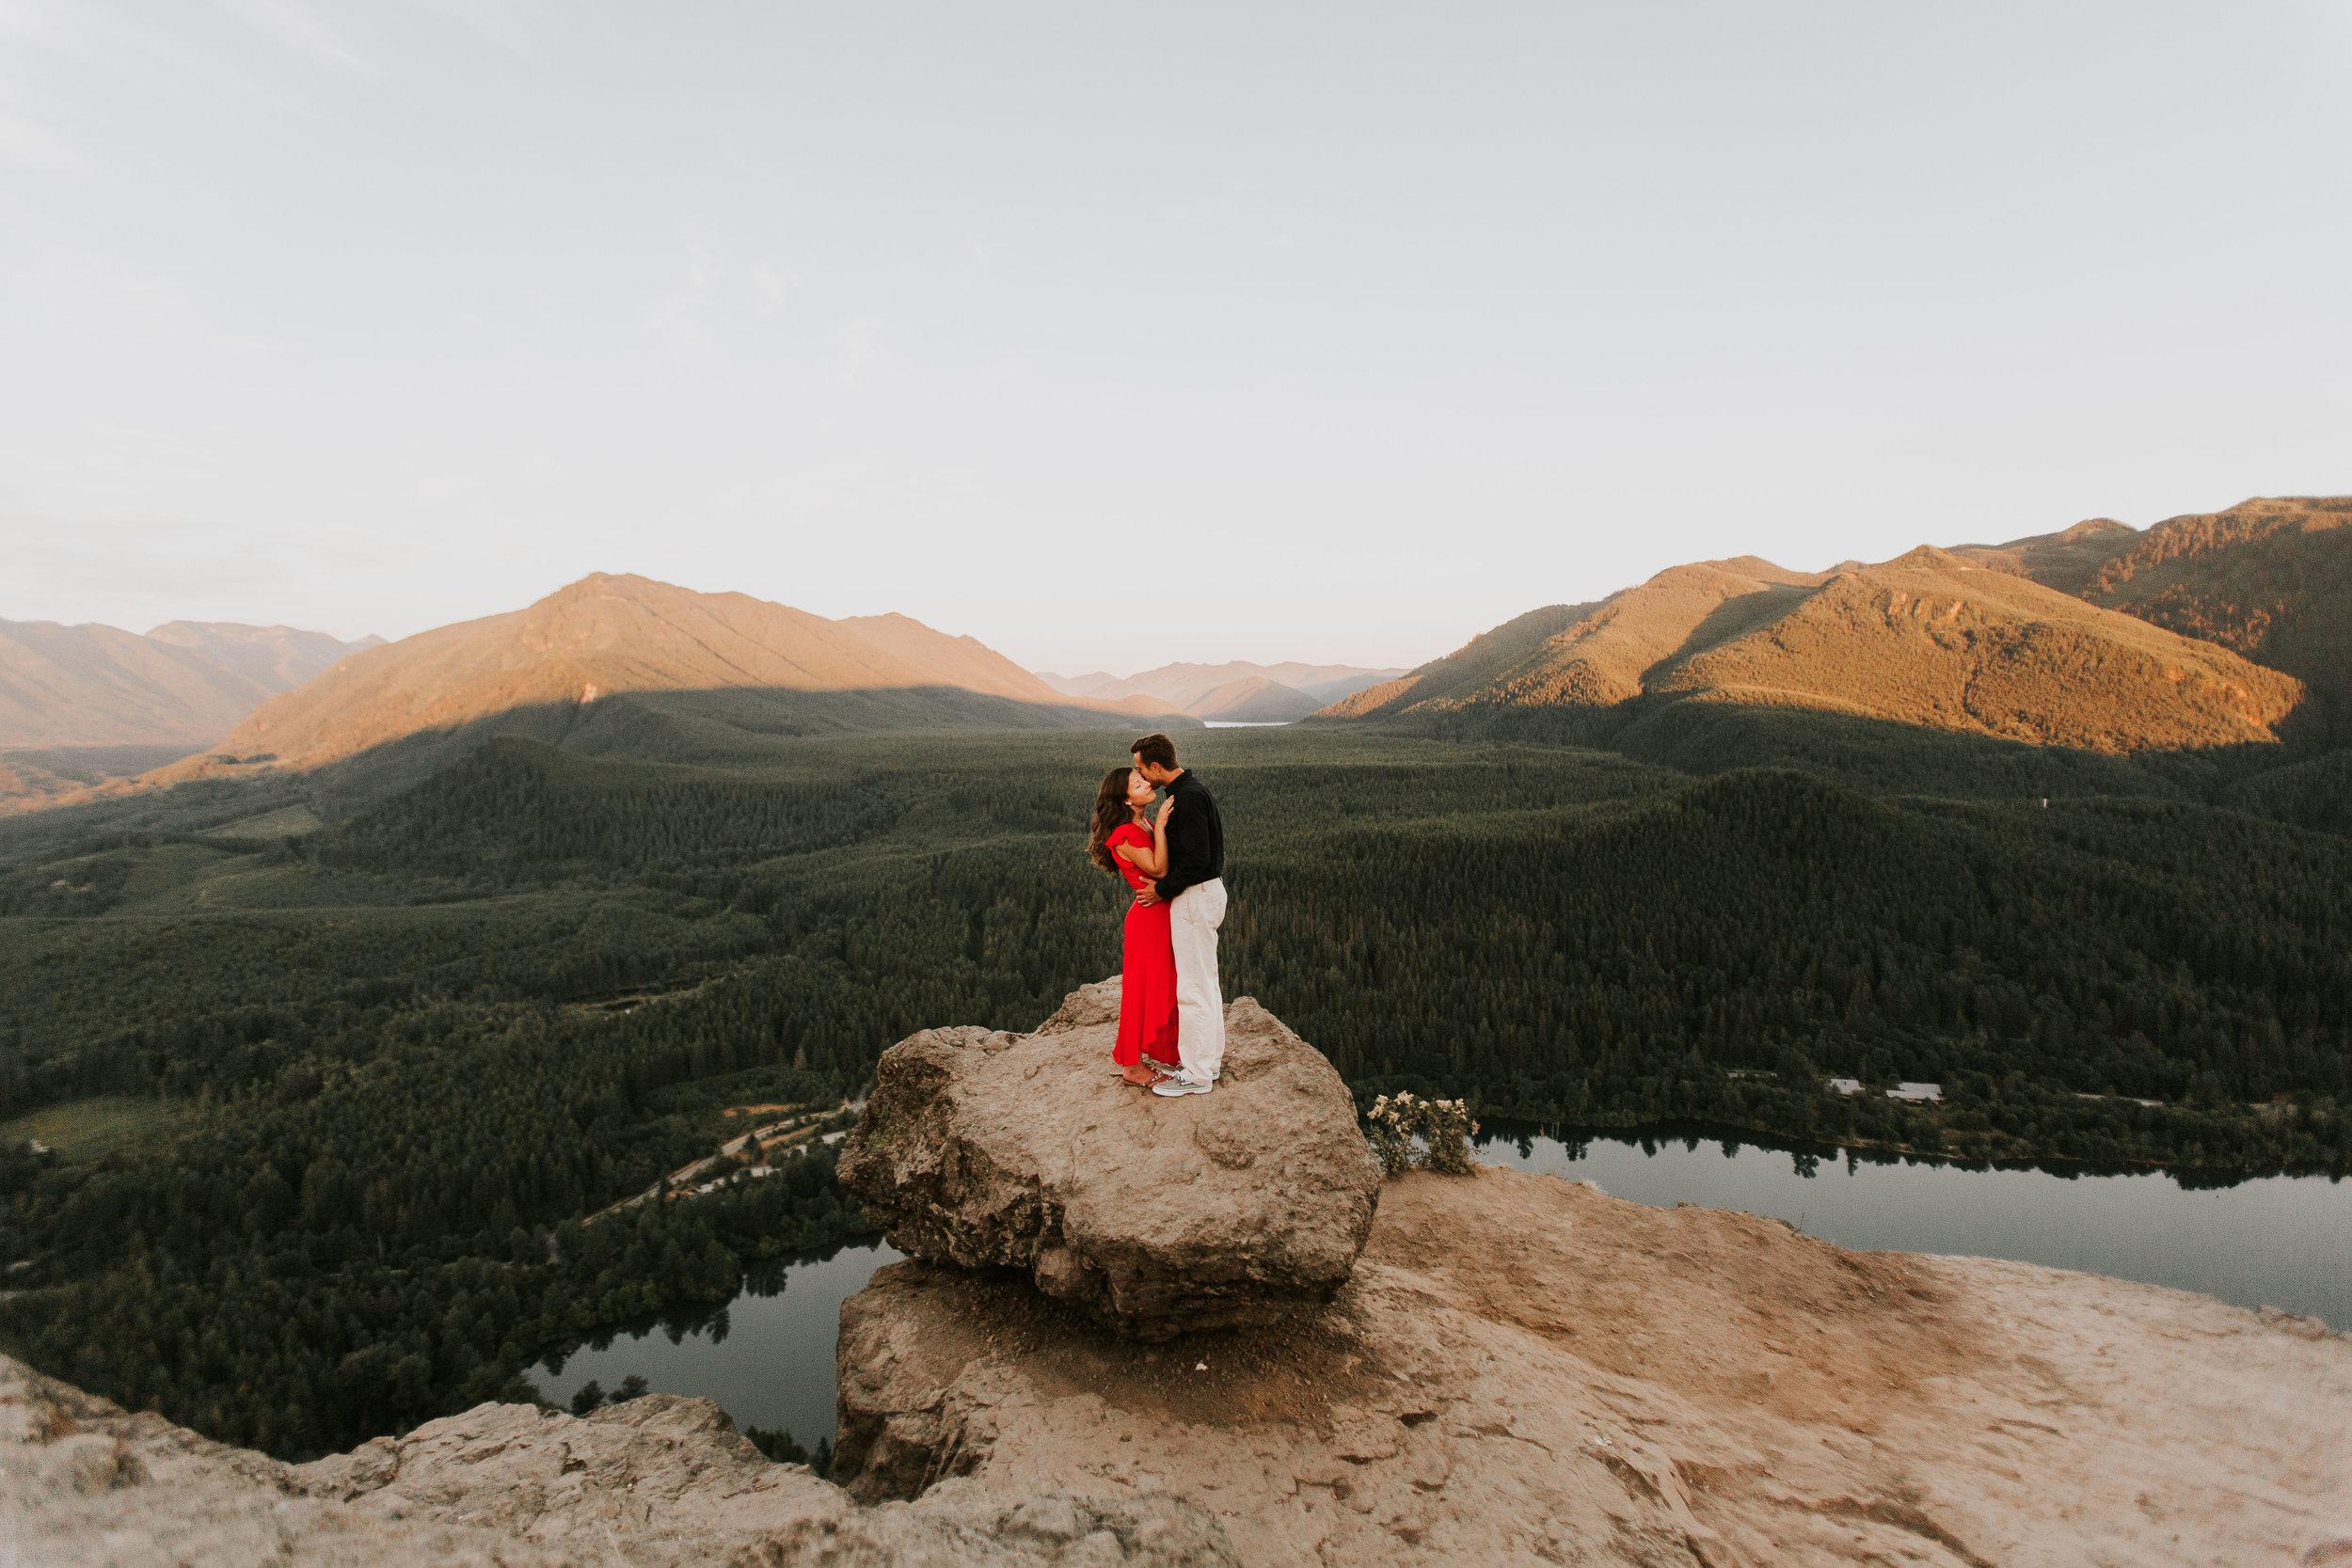 nicole-daacke-photography-rattlesnake-ridge-adventurous-engagement-session-hiking-seattle-washington-destinatino-elopement-intimate-wedding-photographer-3.jpg